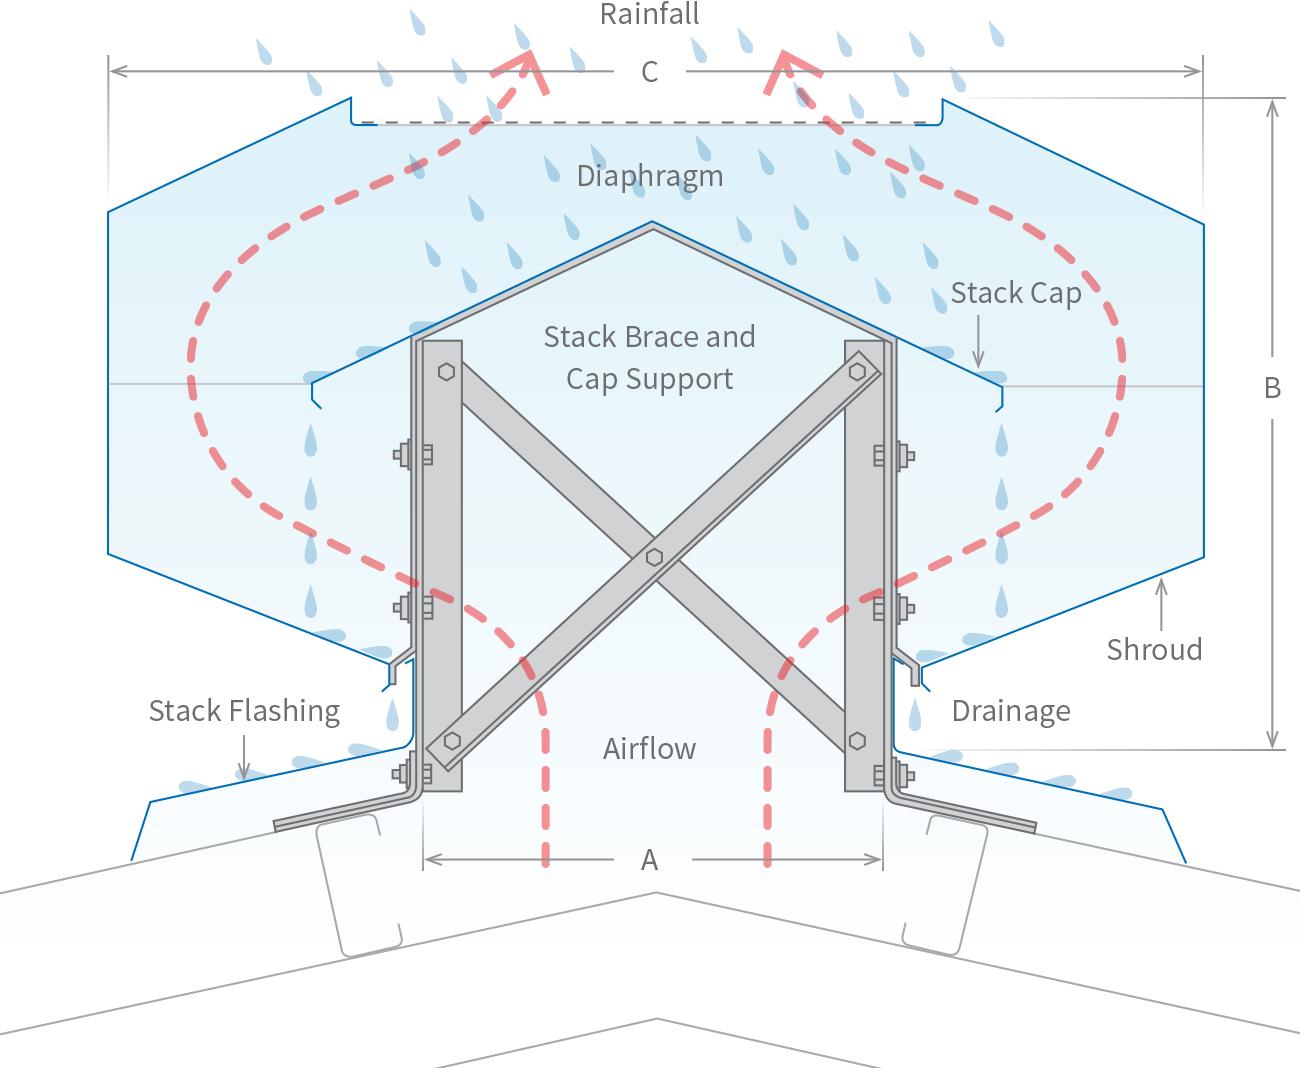 Stratflo Ventridge Roofing Ventilation Diagram Roof Detail Building Ventilation Ridge Vent